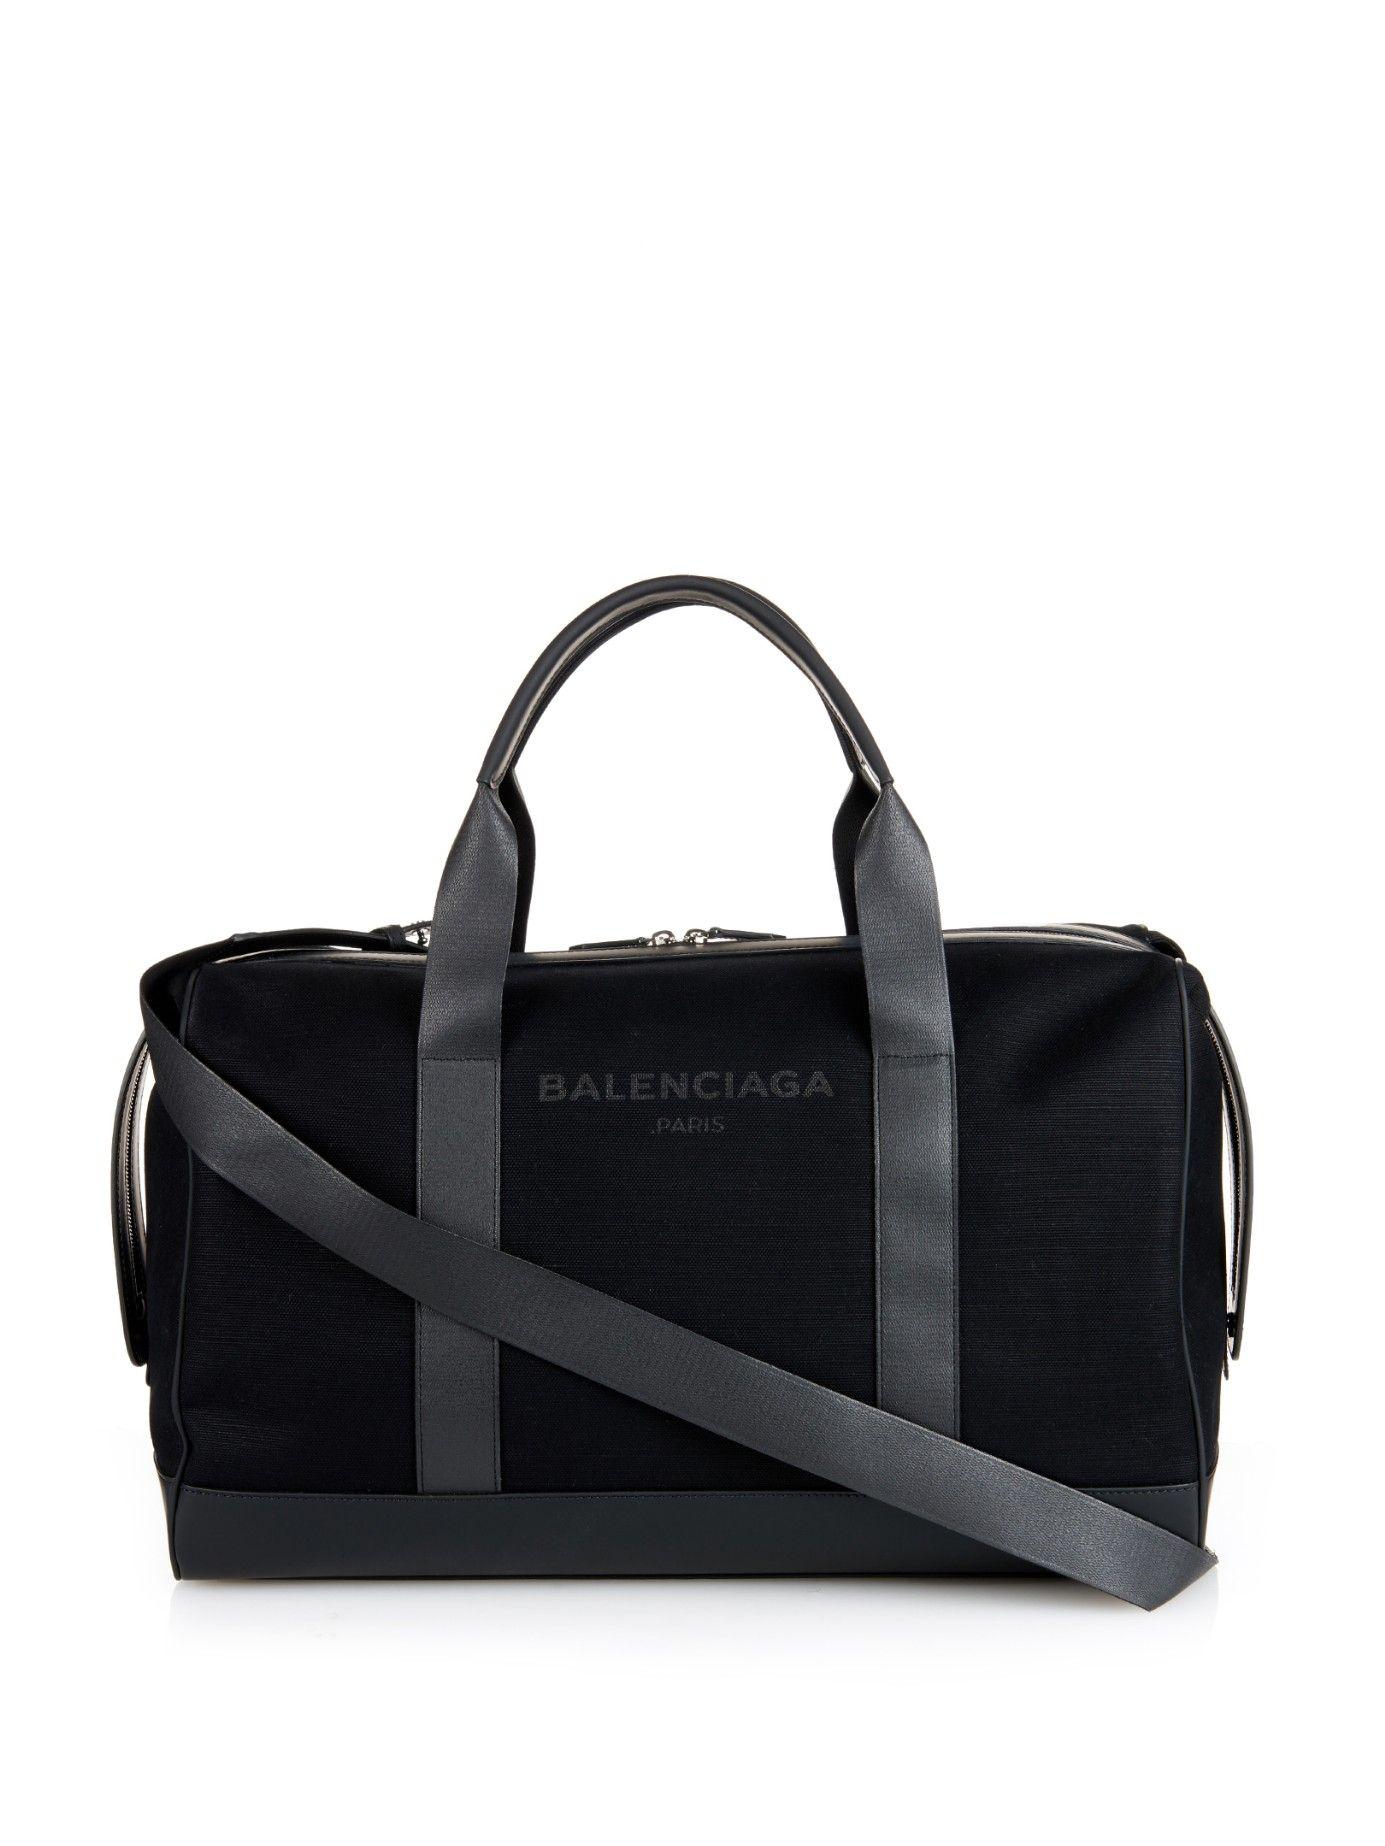 247312b7cbe9 Black canvas weekend bag